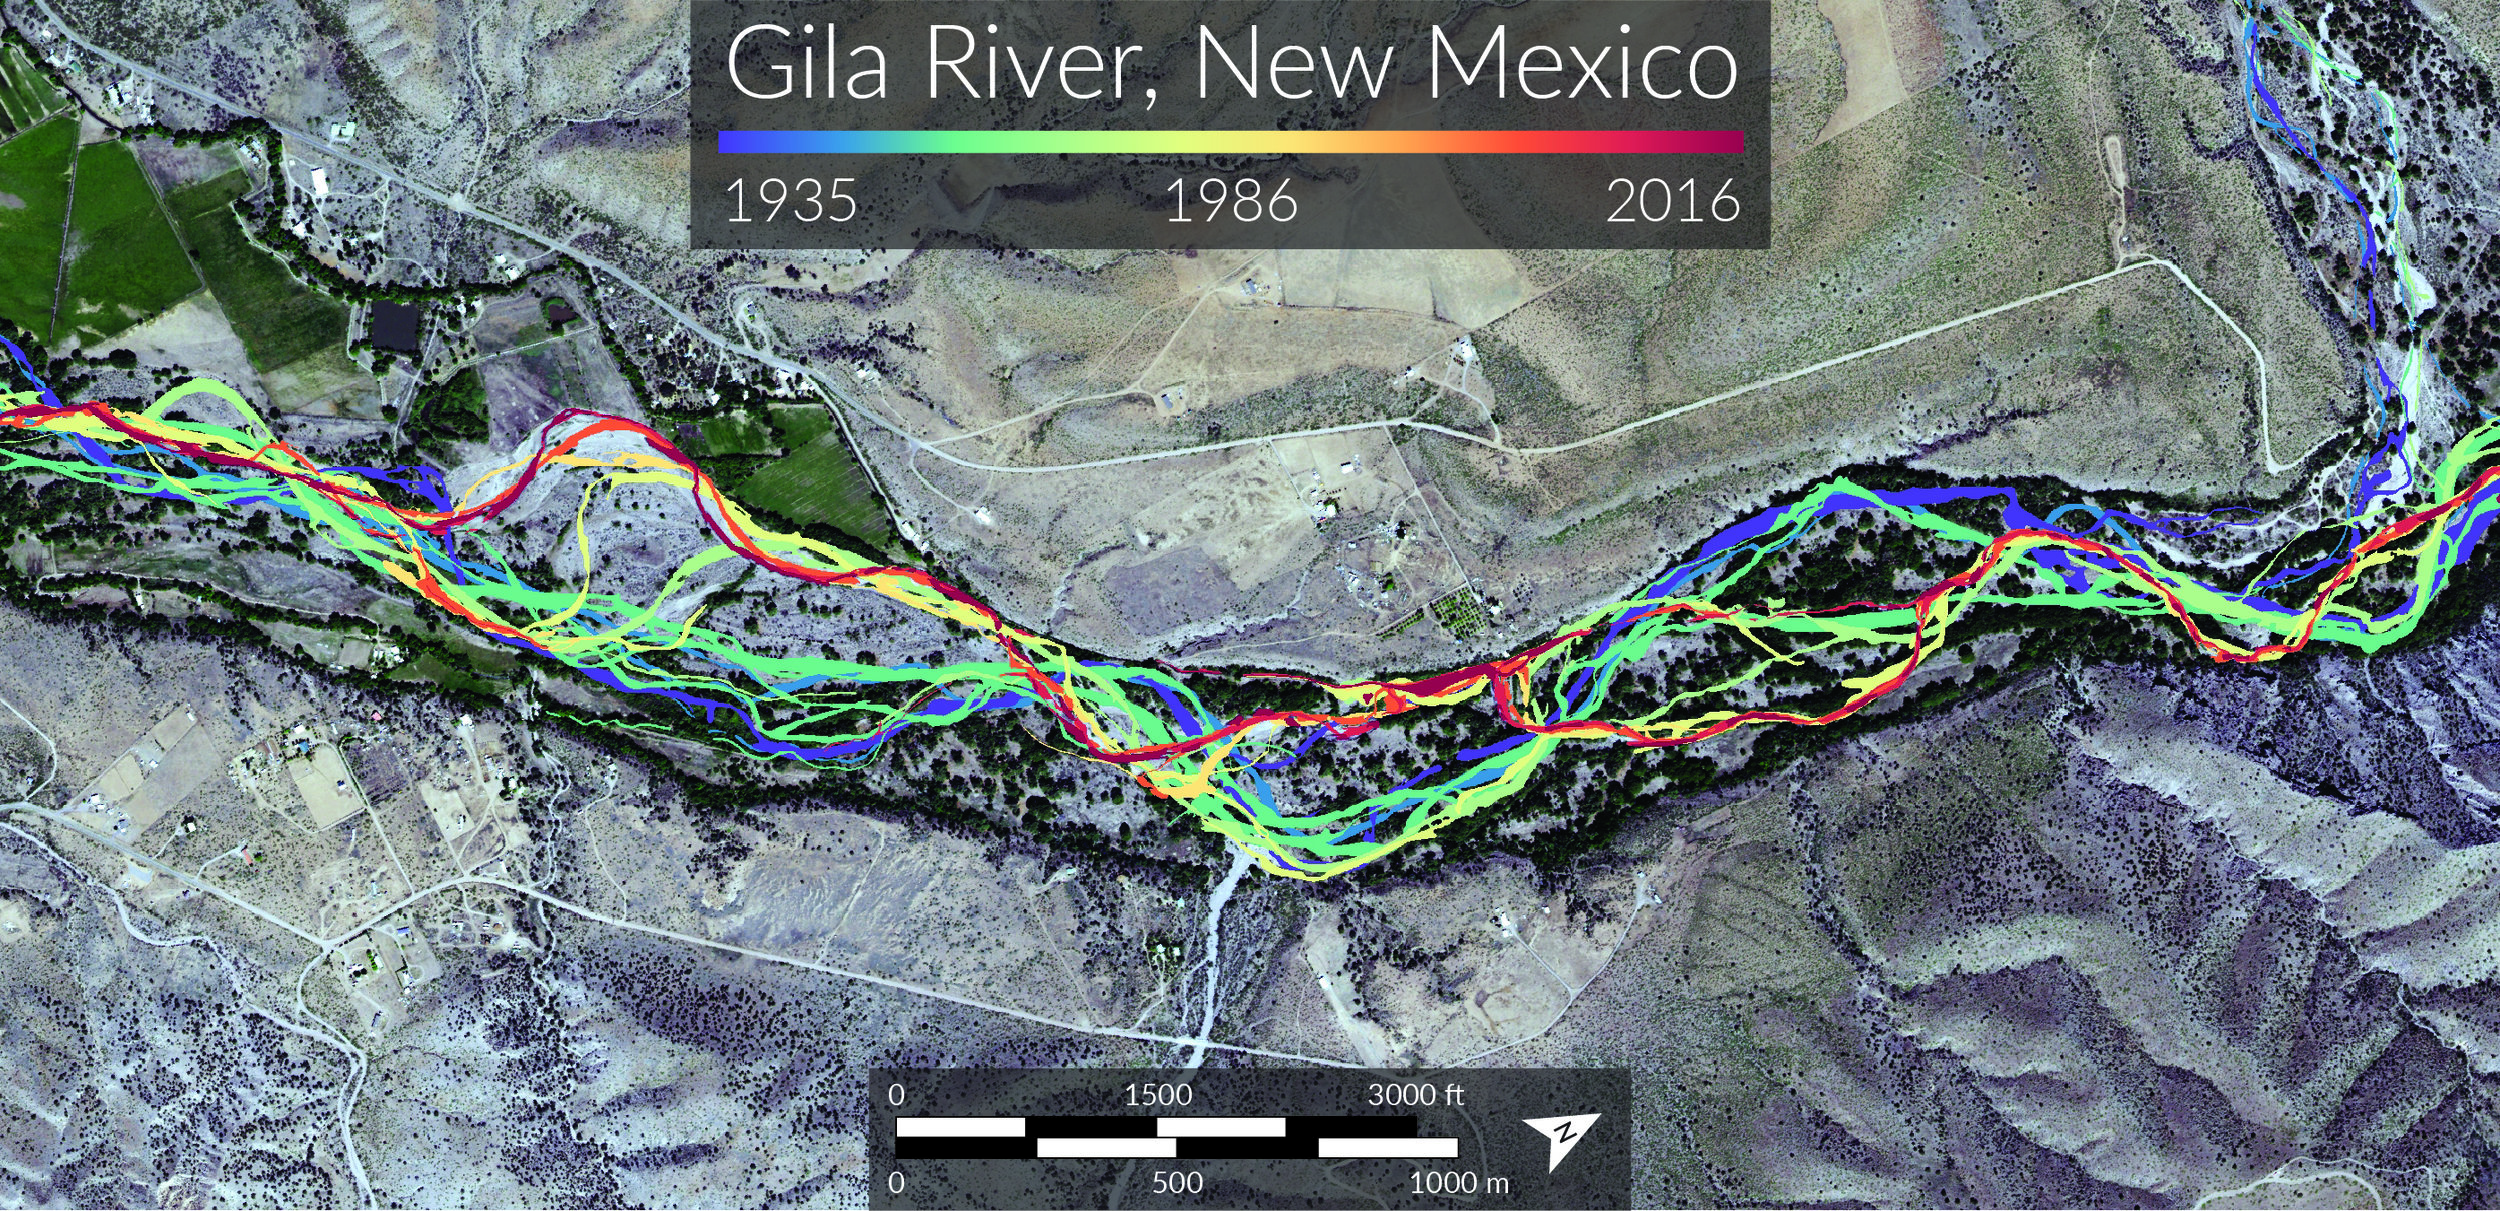 Gila_River_Segments-04.jpg